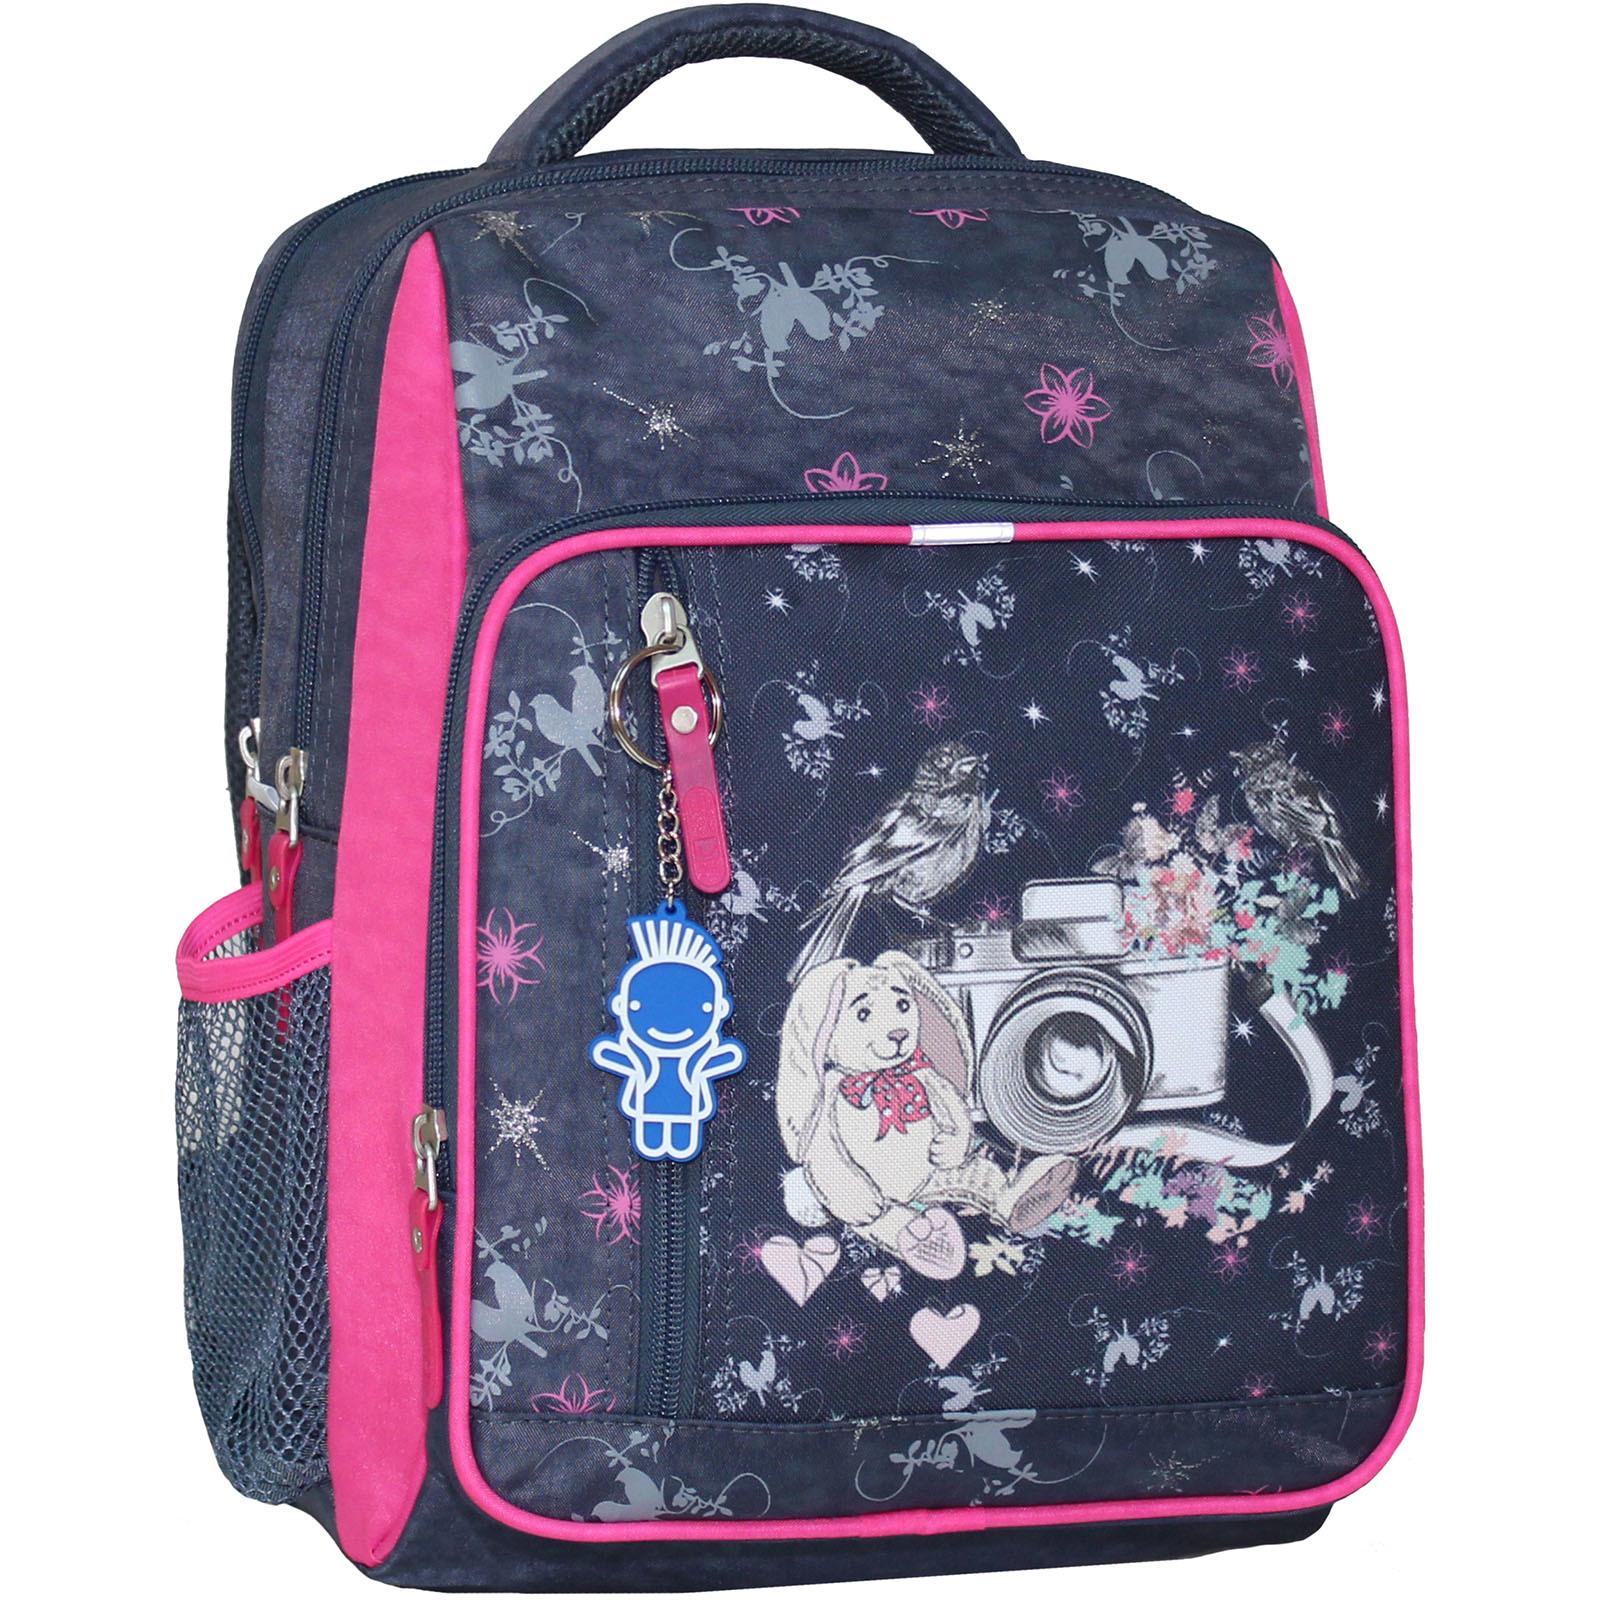 Школьные рюкзаки Рюкзак школьный Bagland Школьник 8 л. 321 серый 210к (00112702) IMG_4994_2210К_.JPG